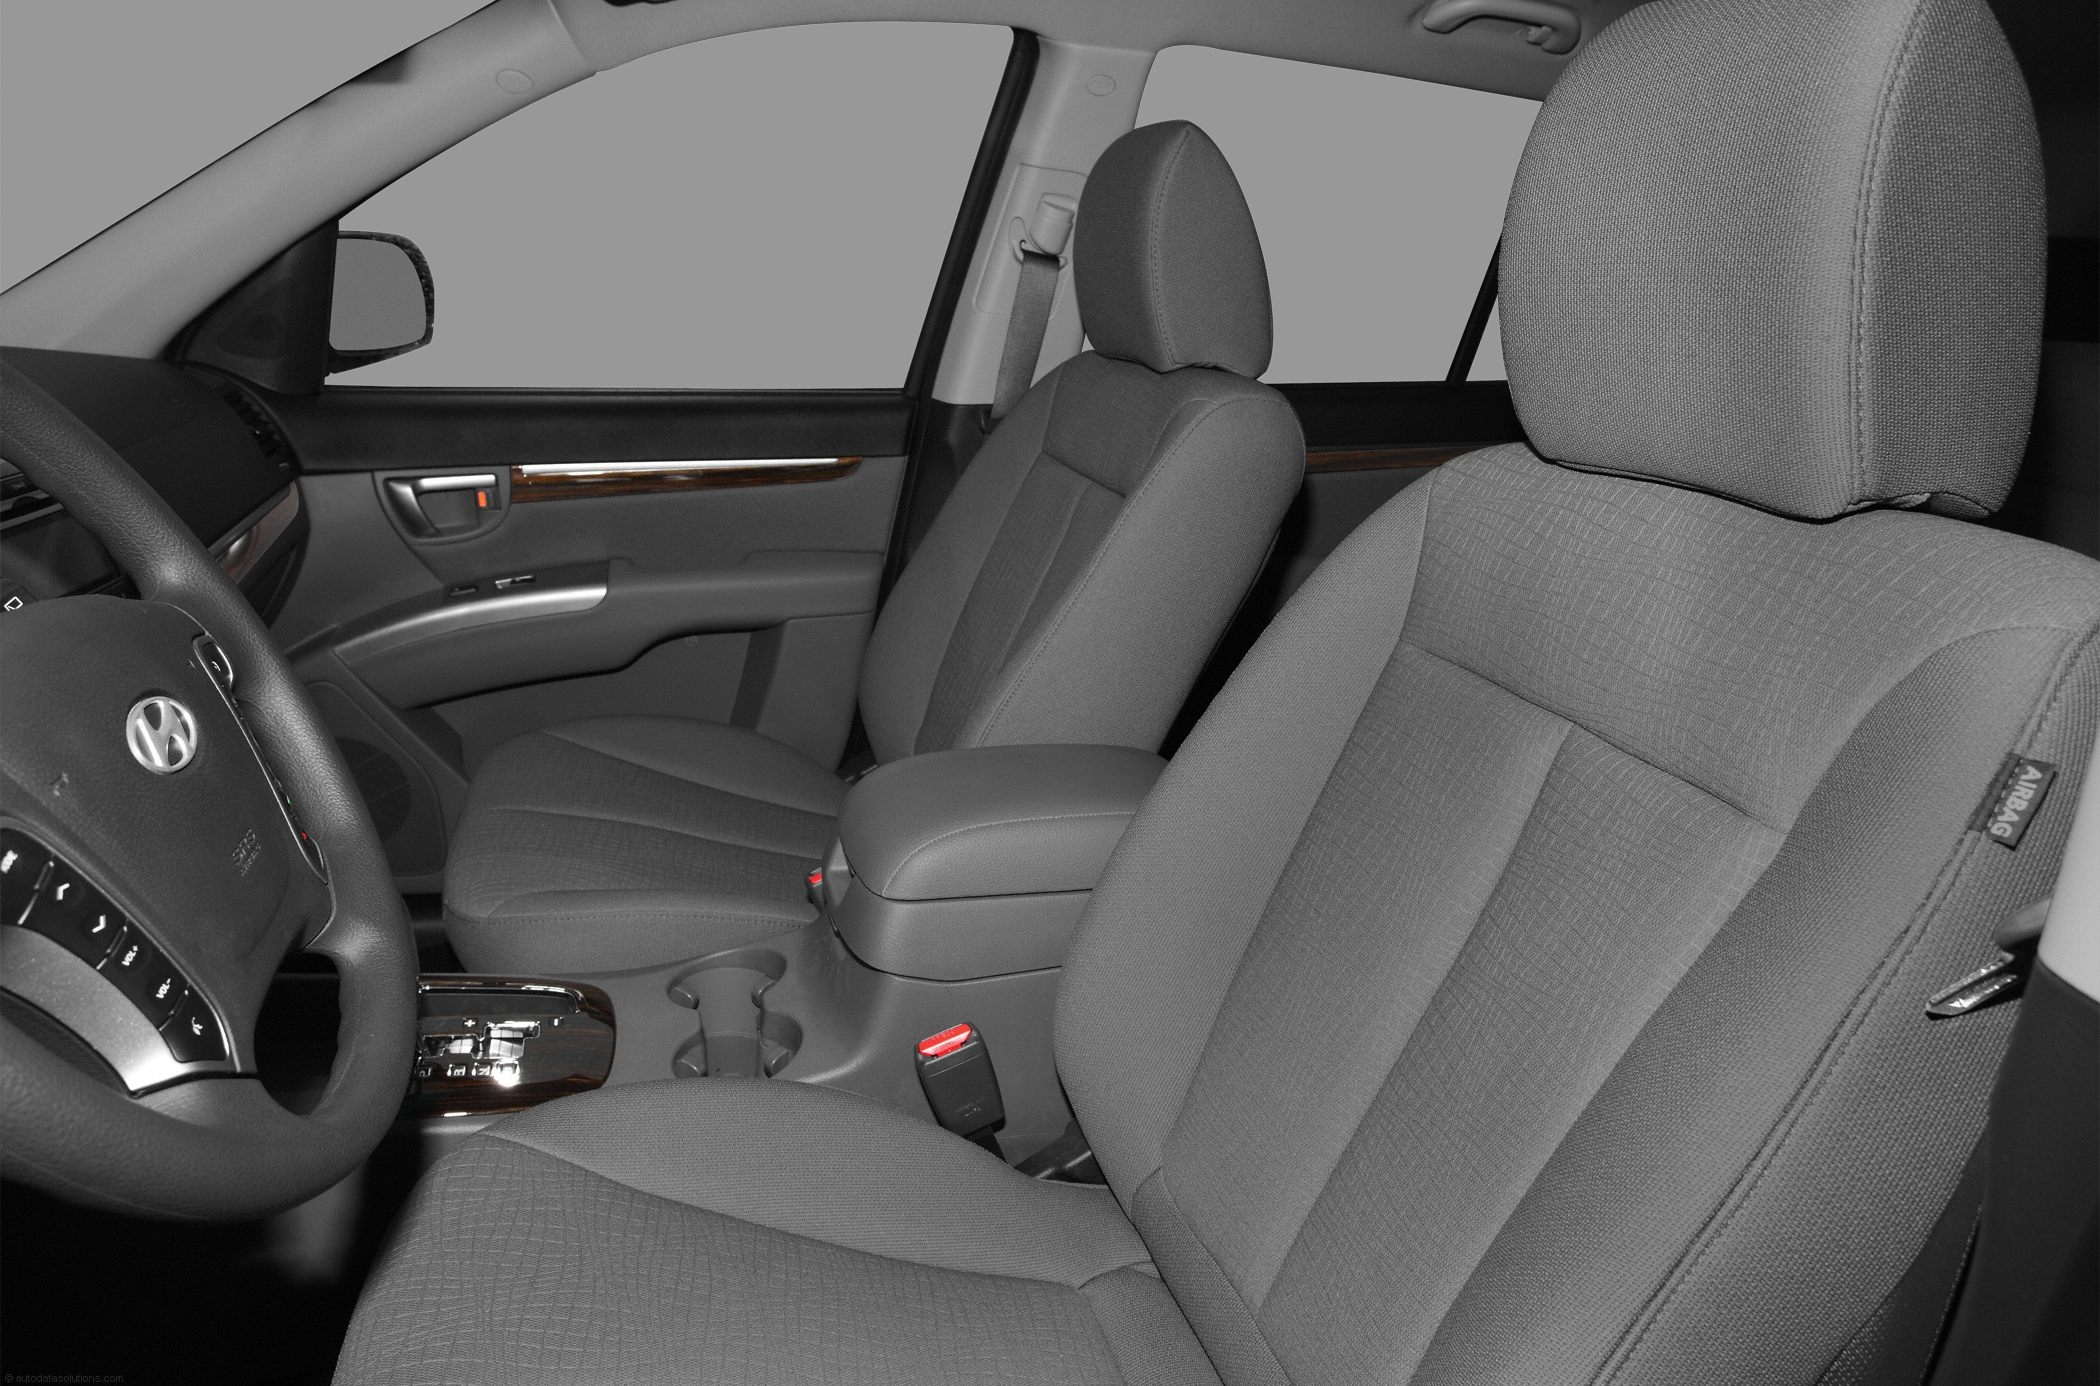 Hyundai Santa Fe Invoice Price